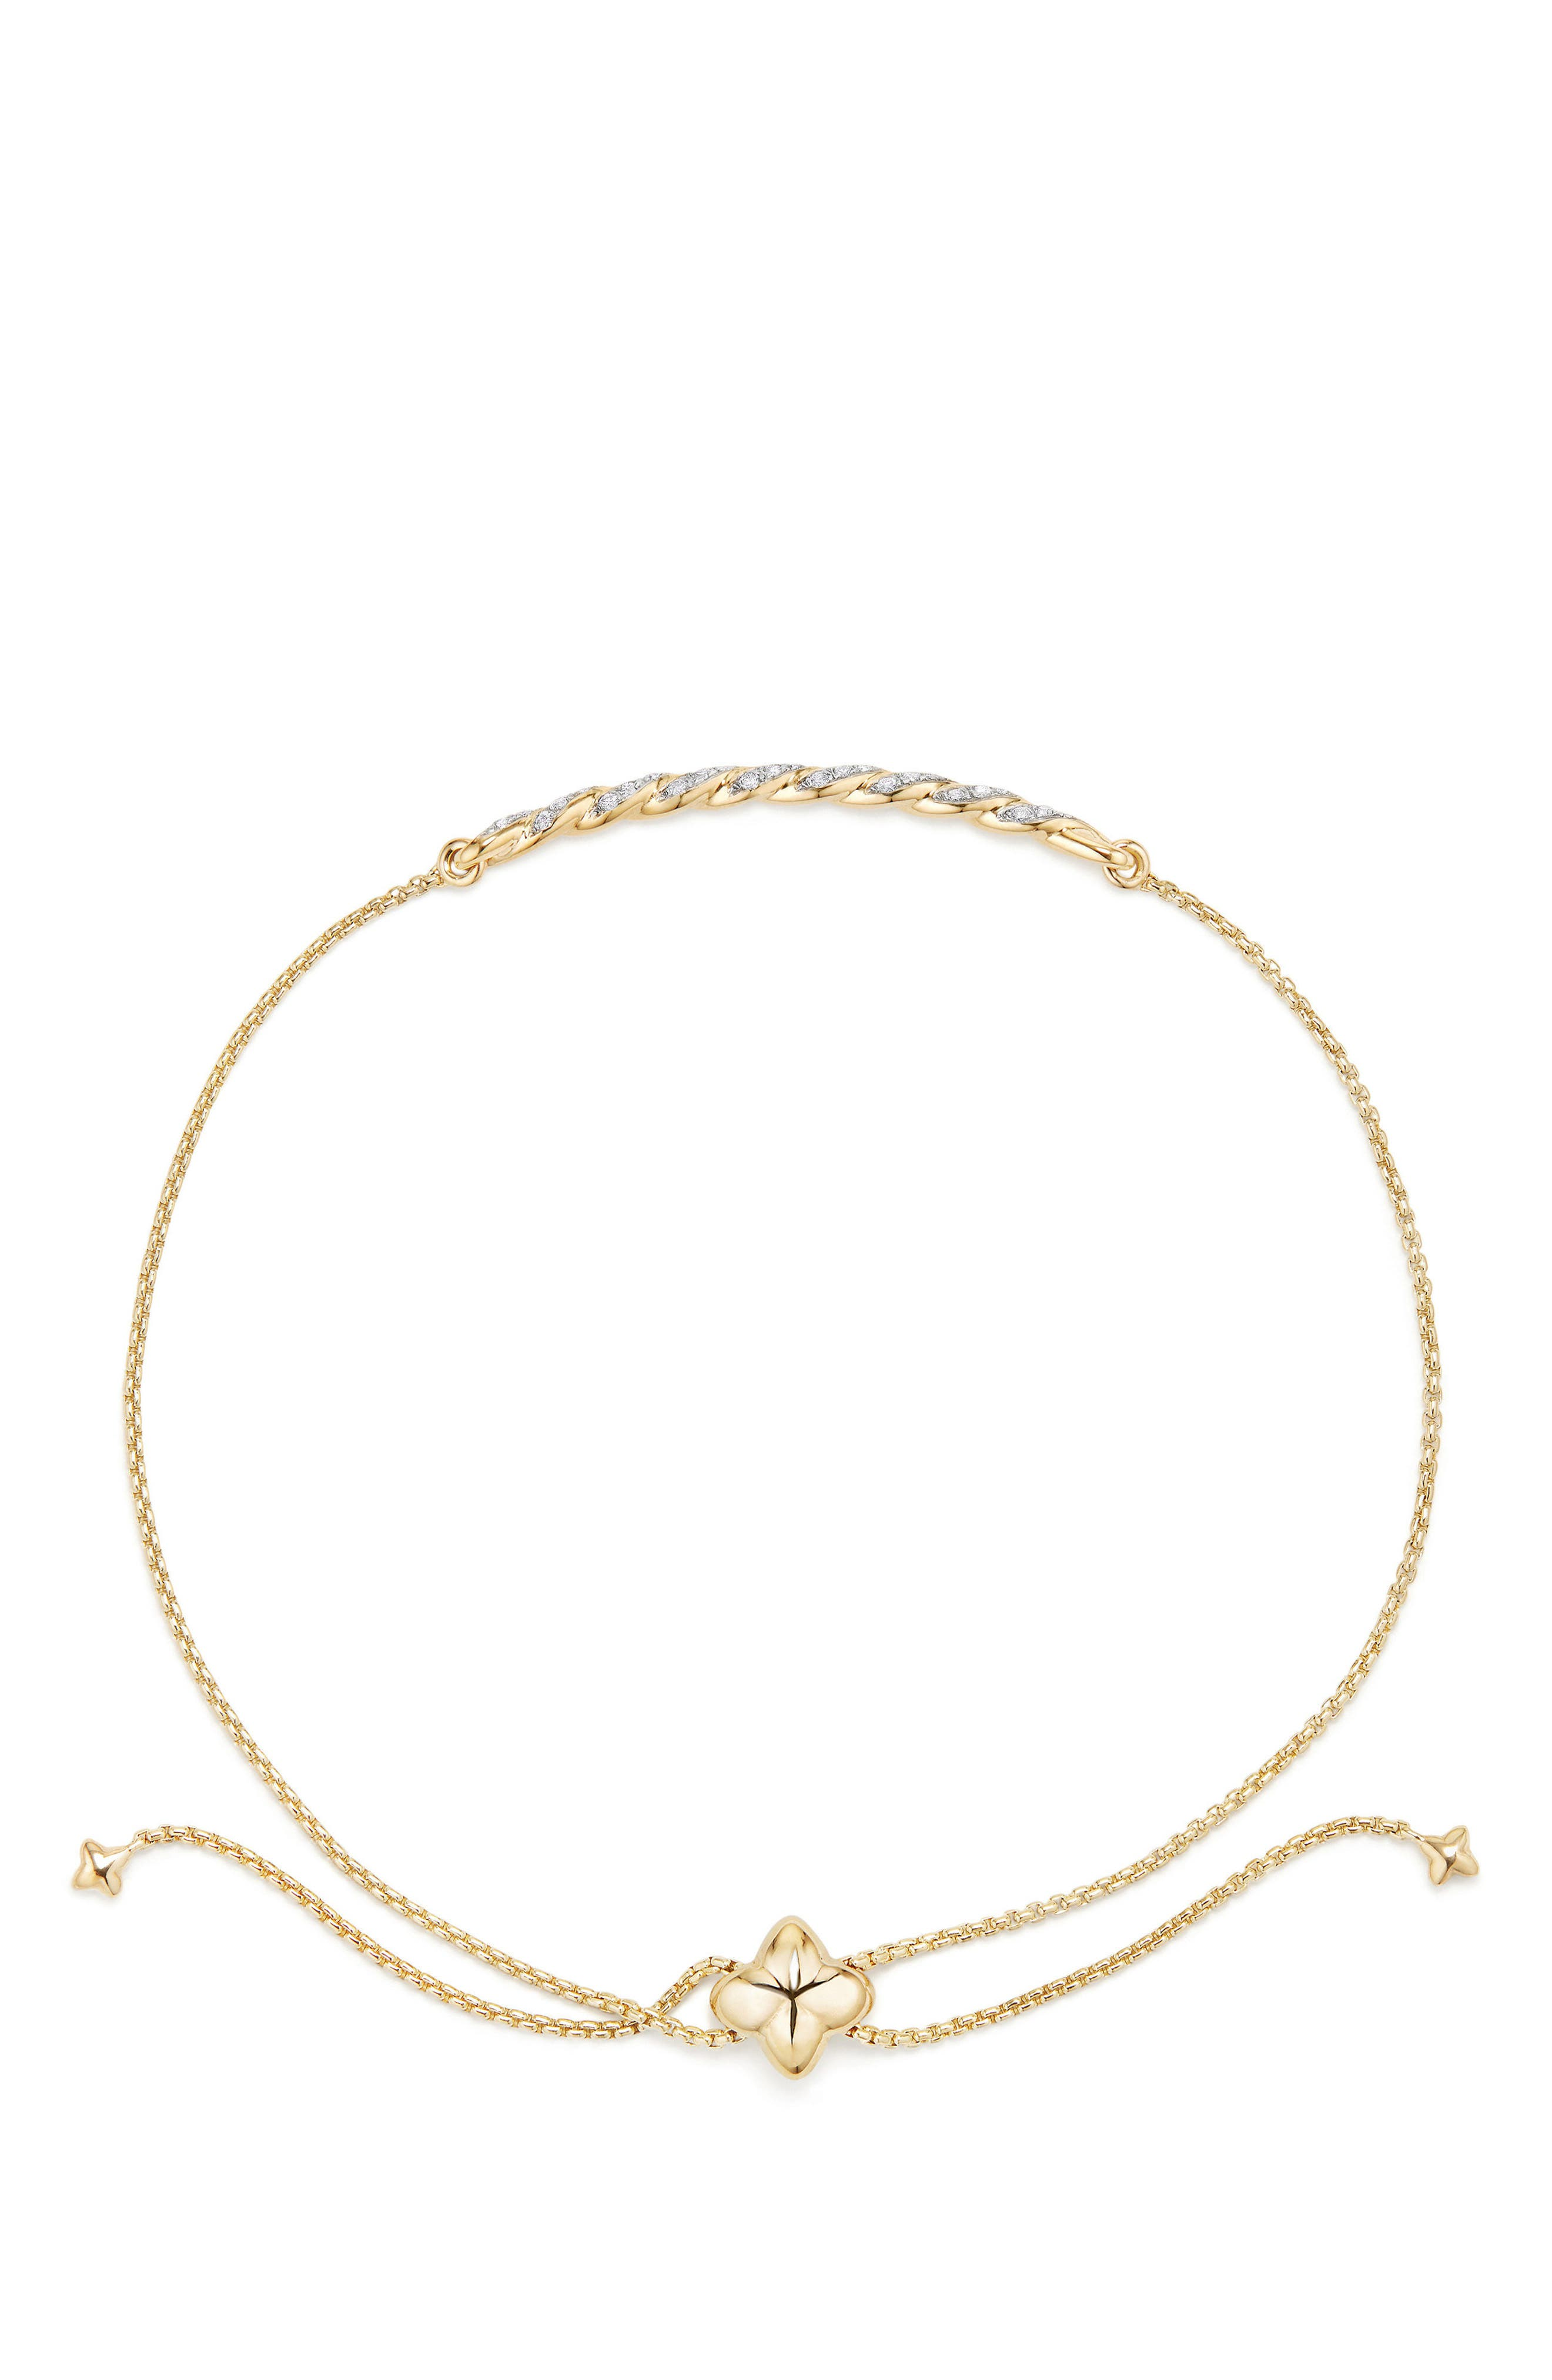 Paveflex Station Bracelet with Diamonds in 18K Gold,                             Alternate thumbnail 2, color,                             Yellow Gold/ Diamond